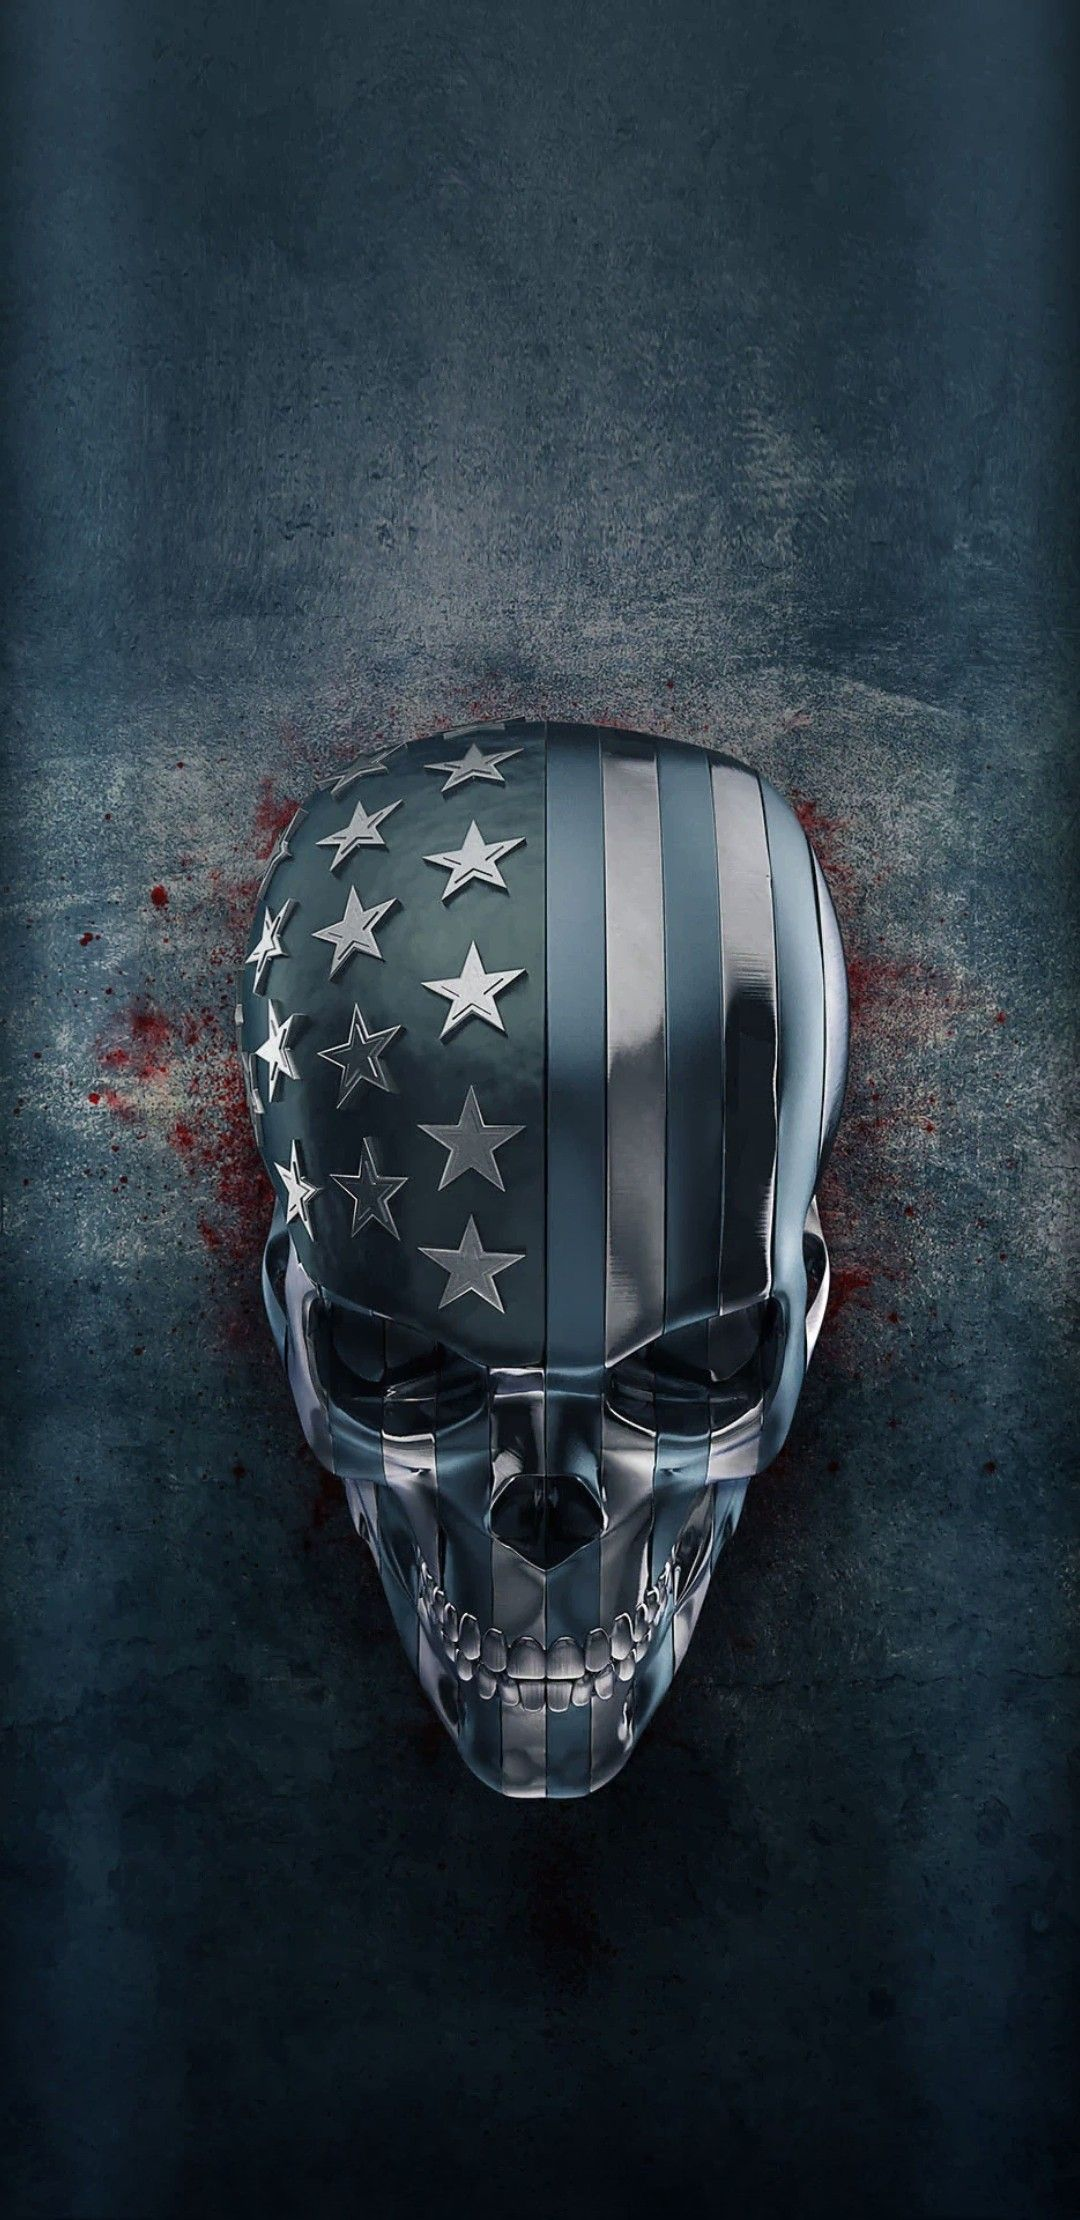 Skull Art Skeleton Skulls Tatuajes Skeletons Sugar